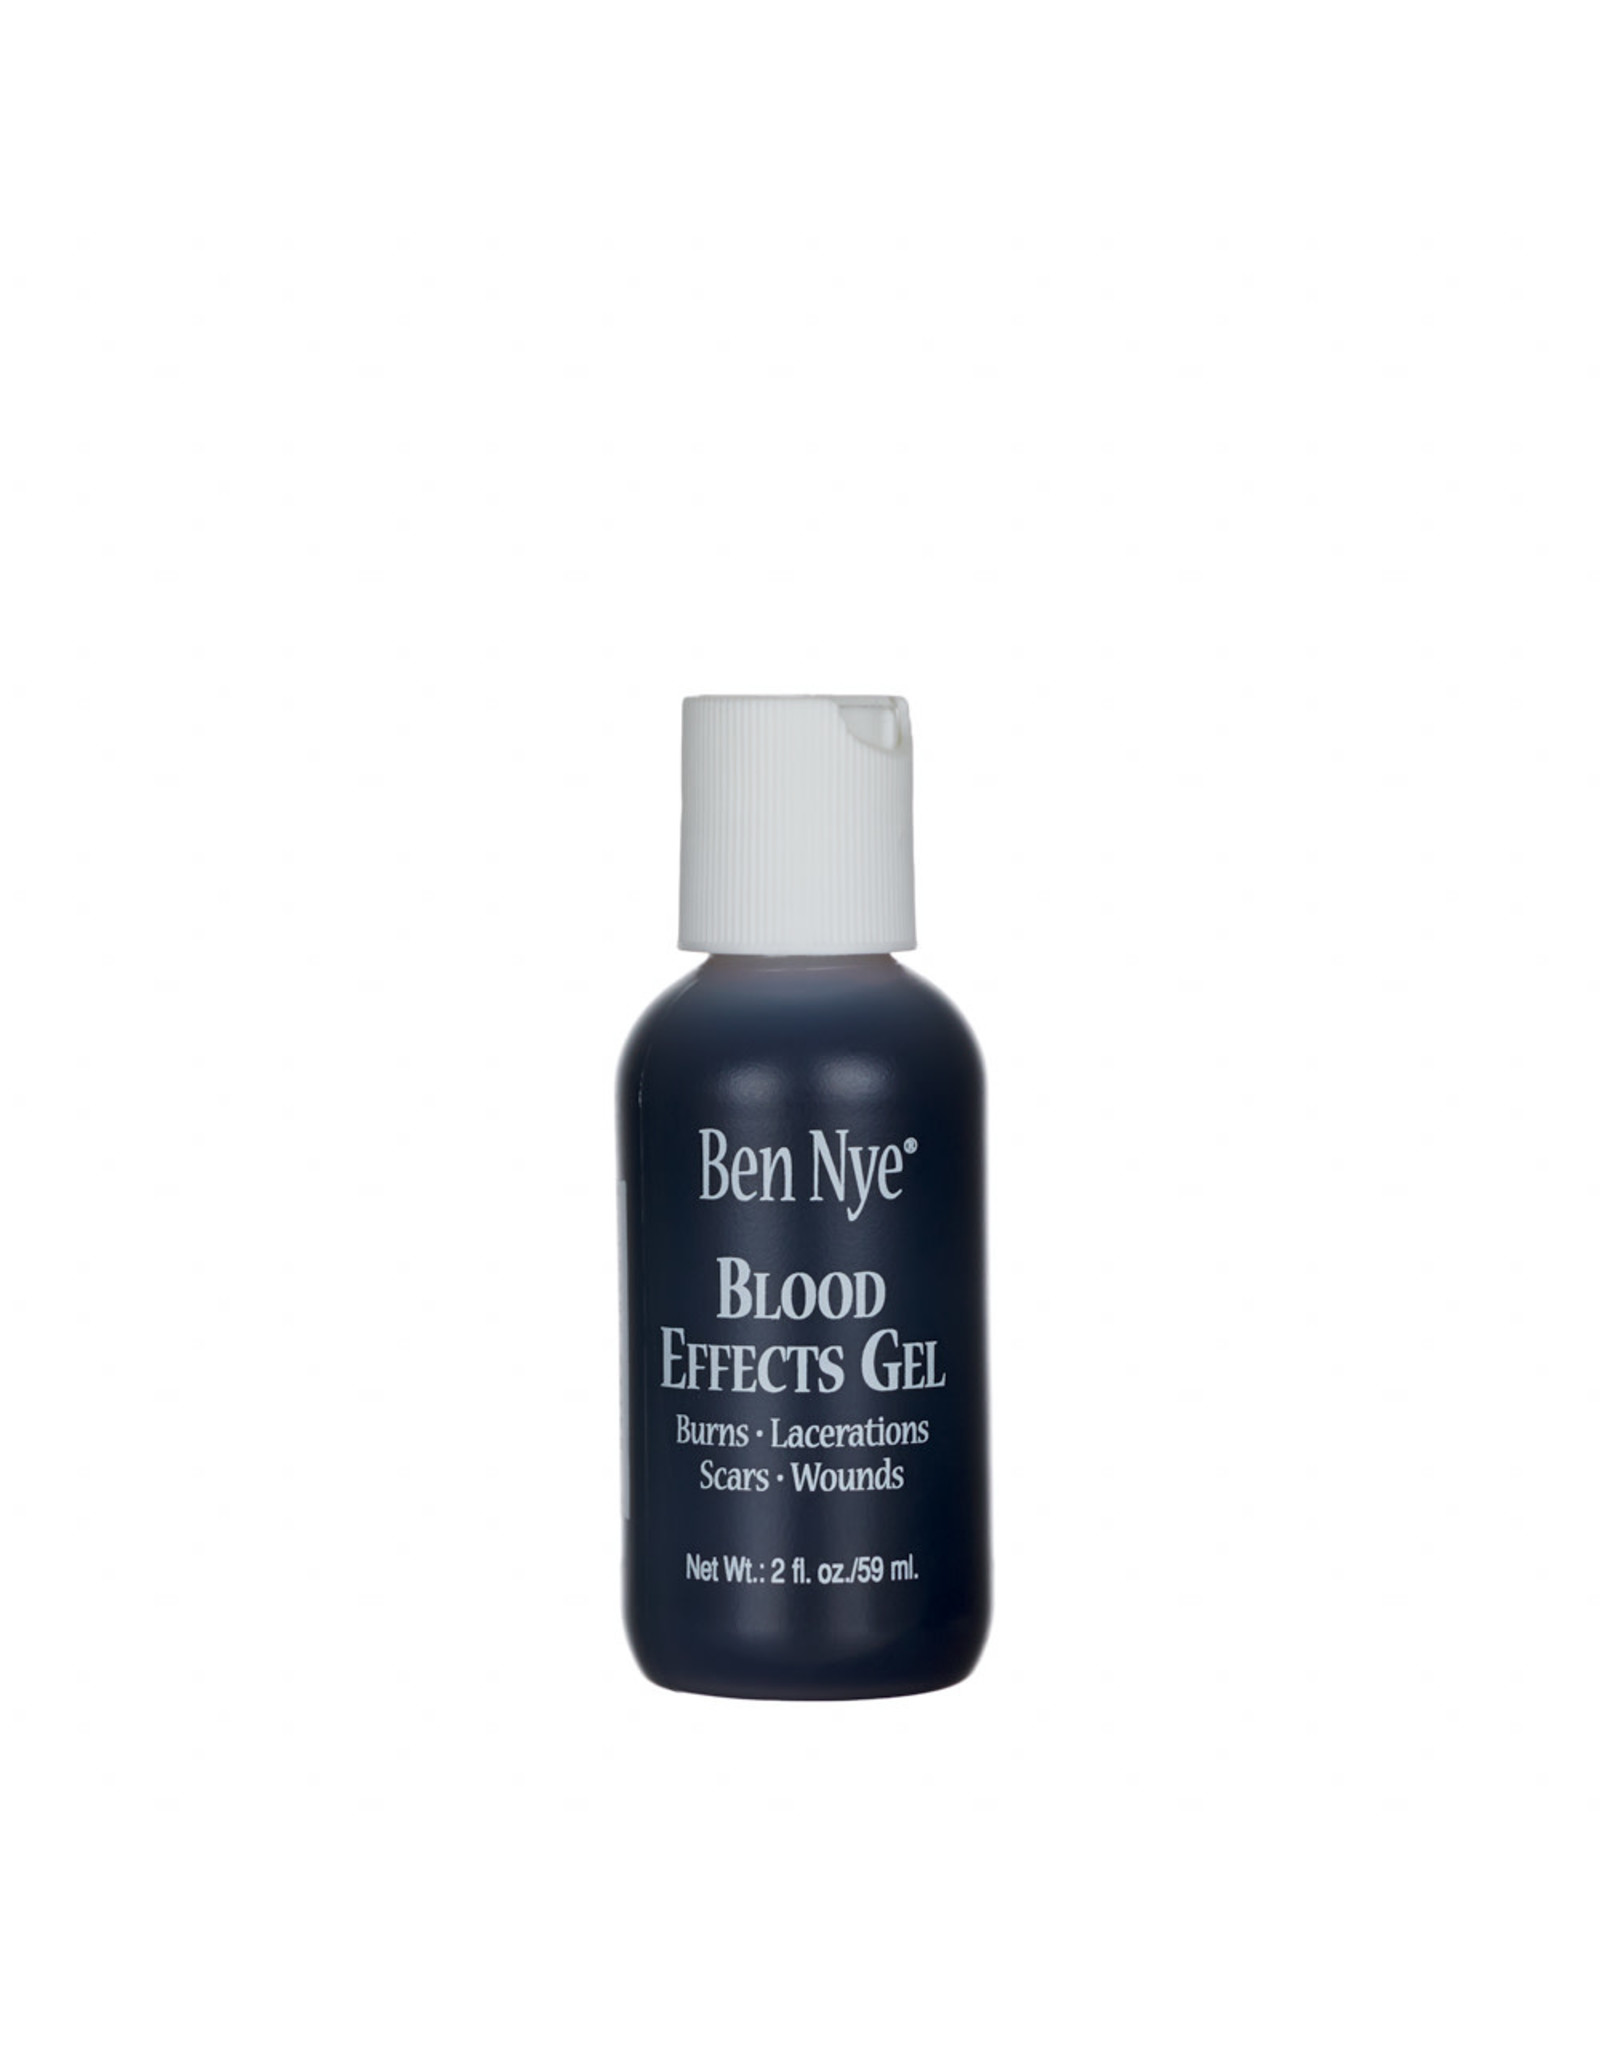 Ben Nye Ben Nye Blood Effects Gel